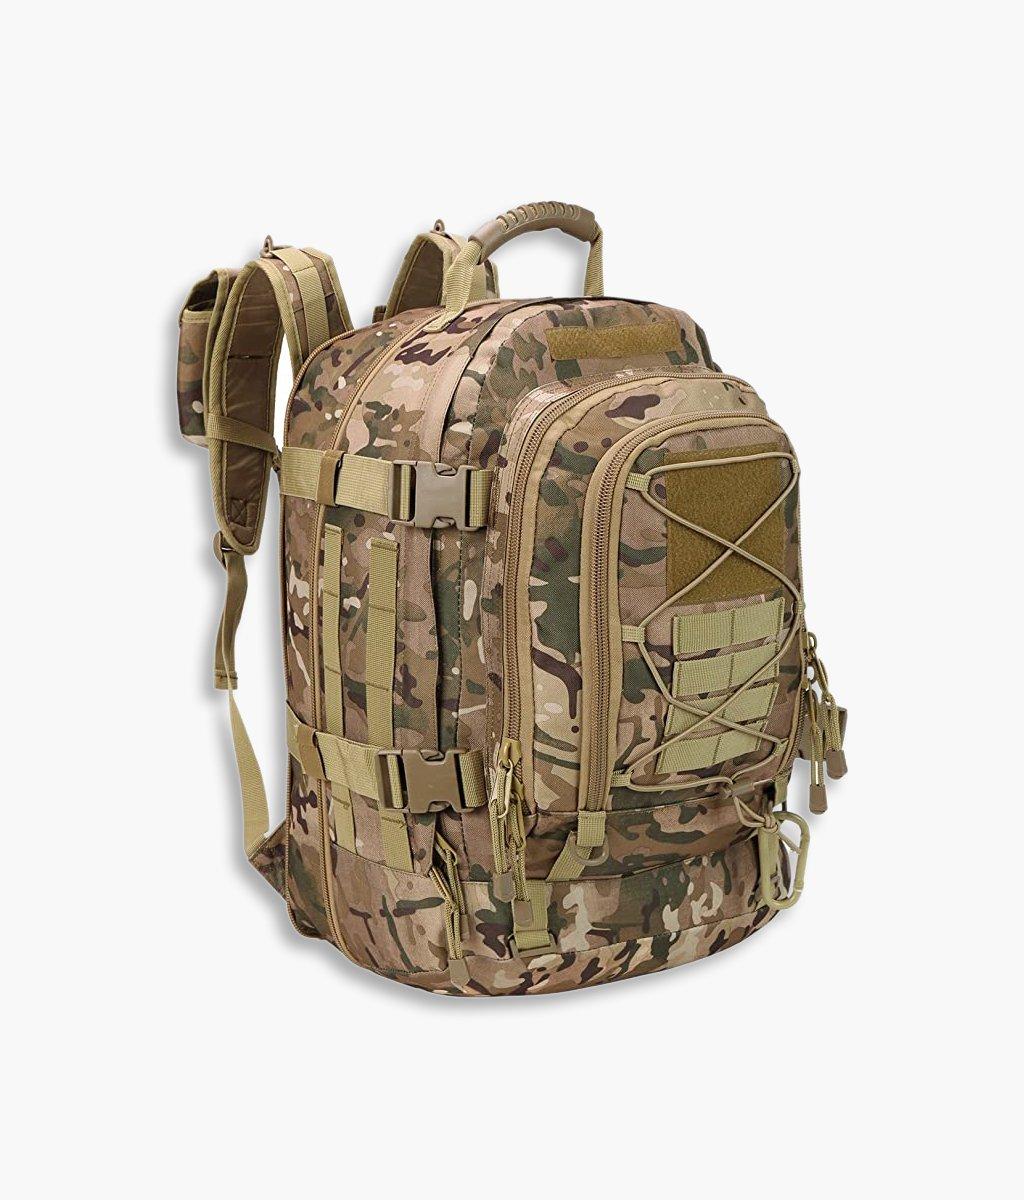 Military Tactical Backpack Waterproof